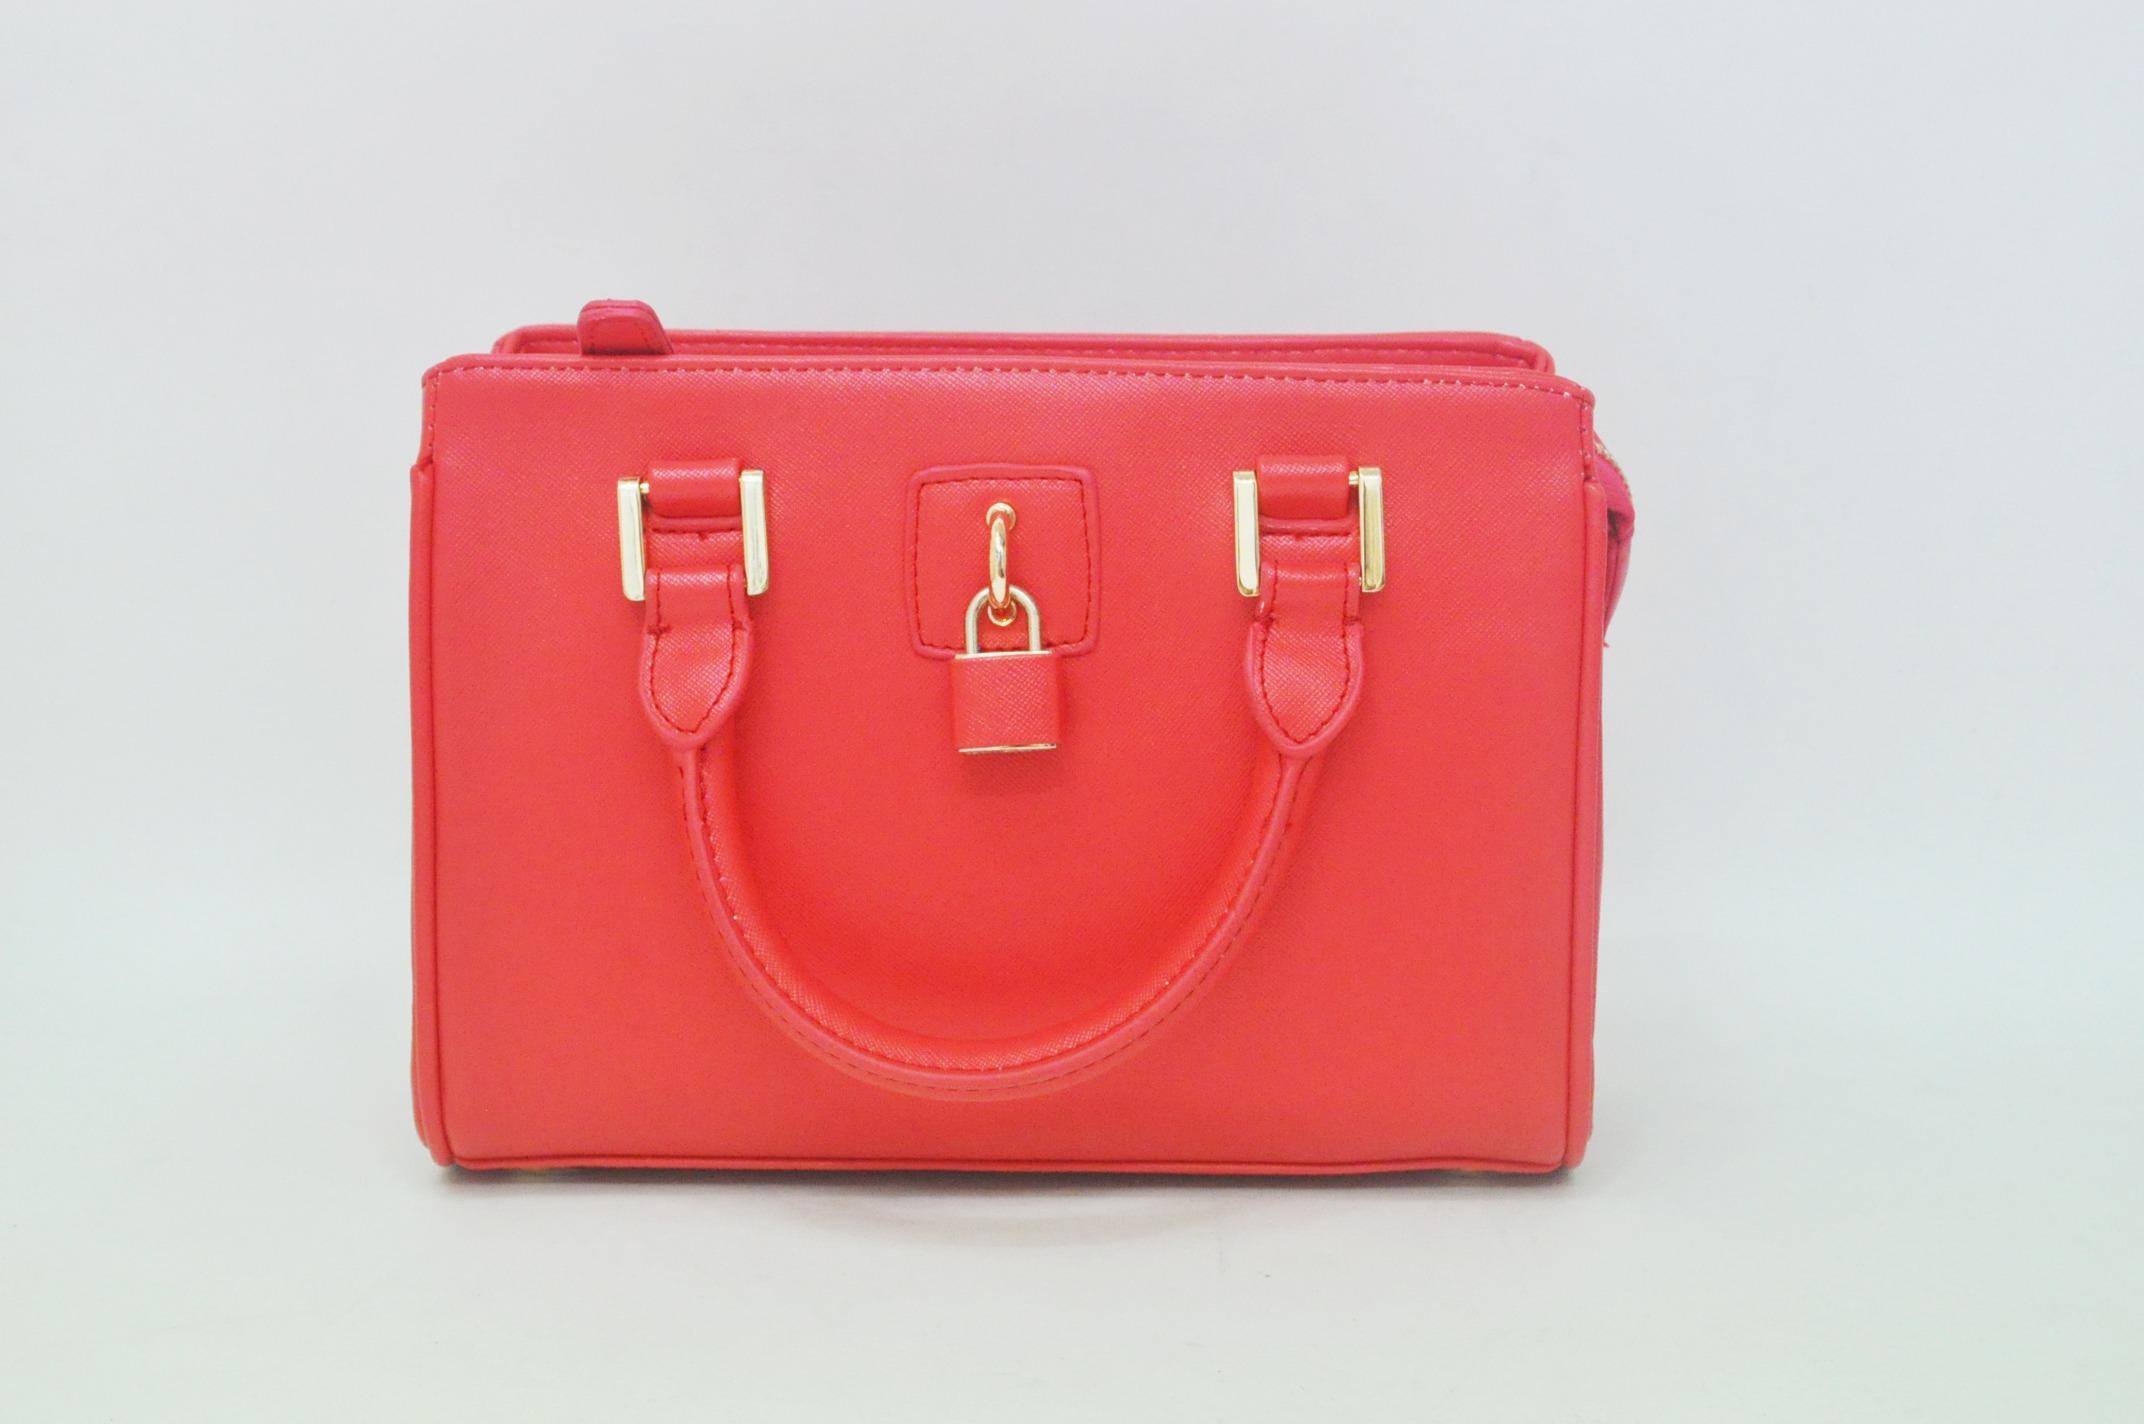 bag-229610